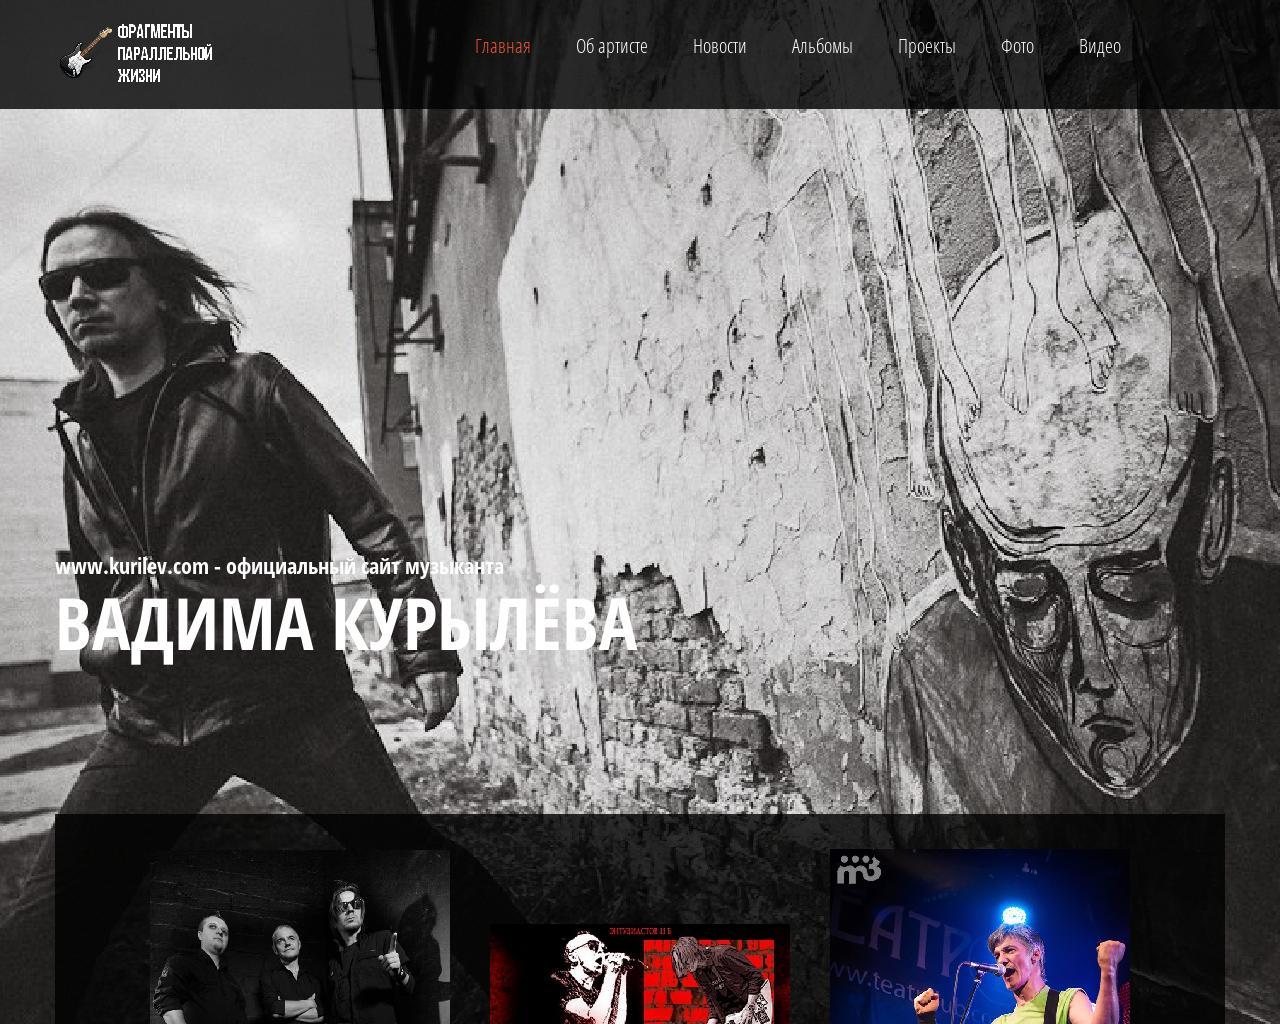 Сайт рок-музыканта Владимира Курылева